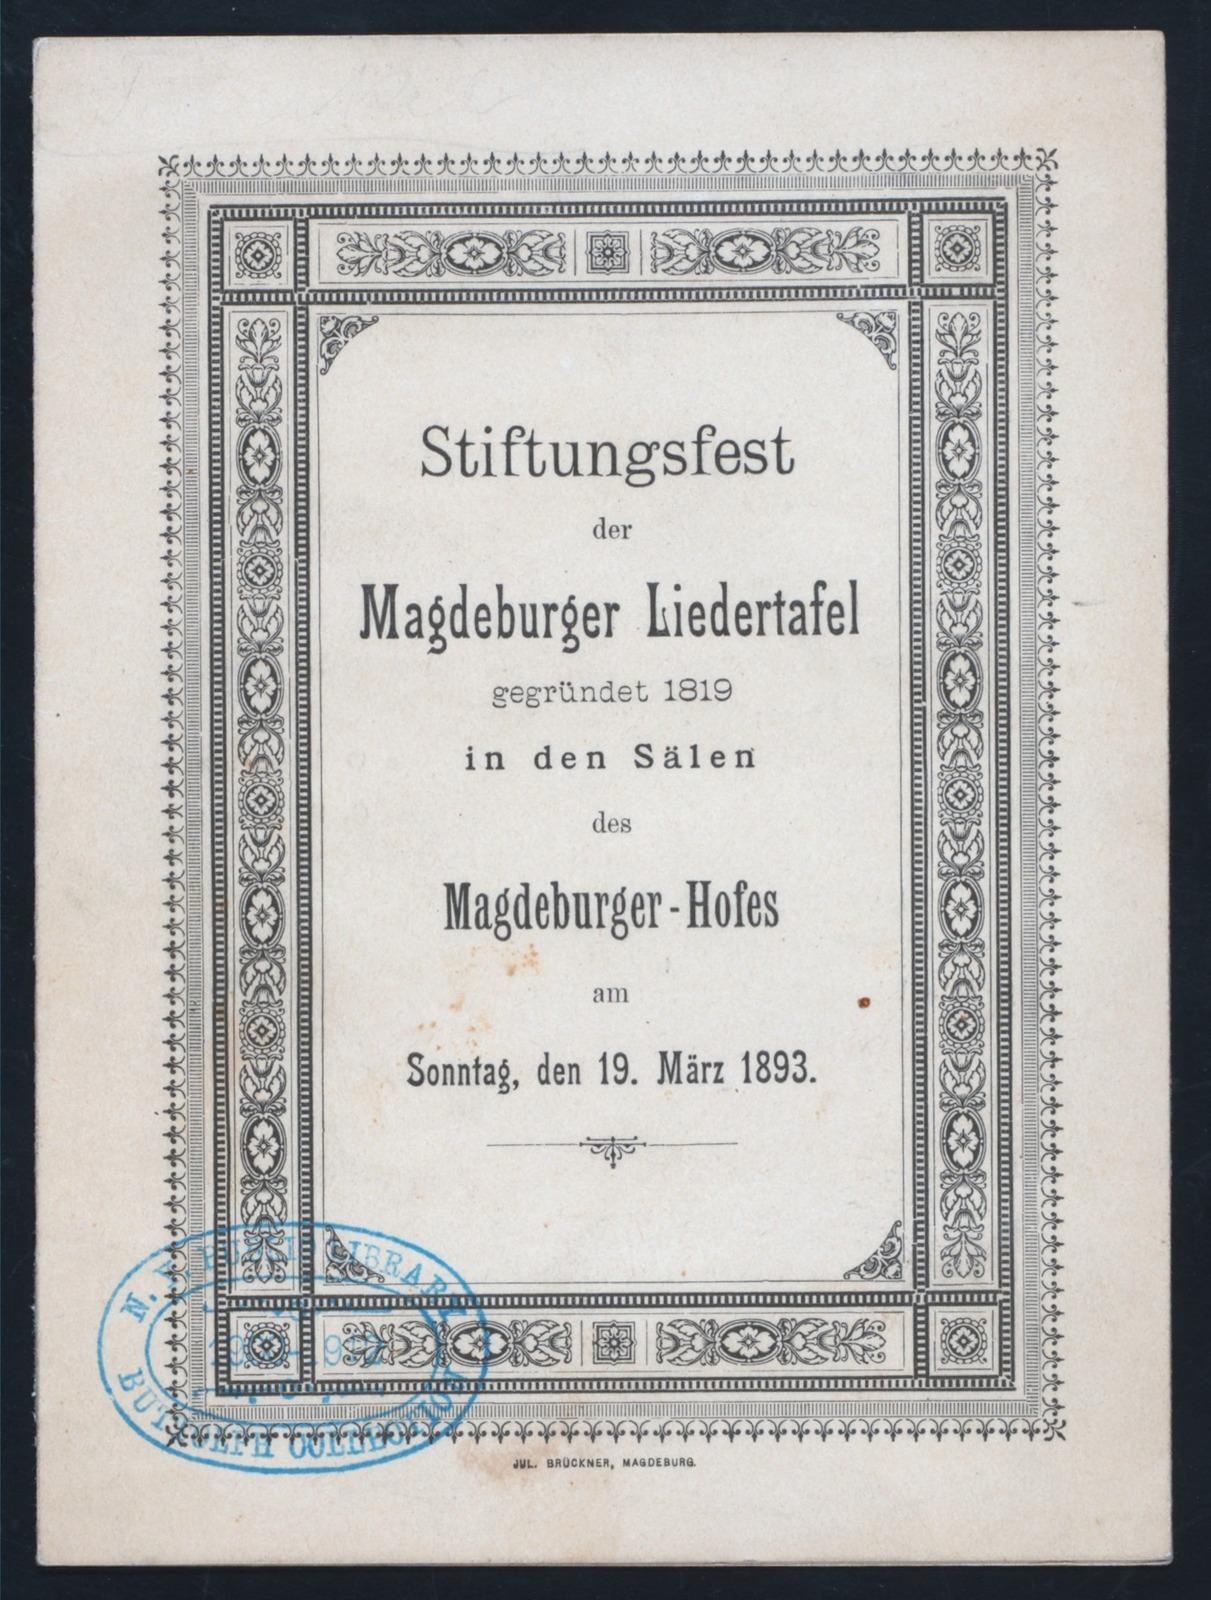 STIFTUNGSFEST [held by] MAGDEBURGER LIEDERTAFEL [at] MAGDEBUGER-HOFES [MAGDEBURG AUSTRIA?] (HOTEL)